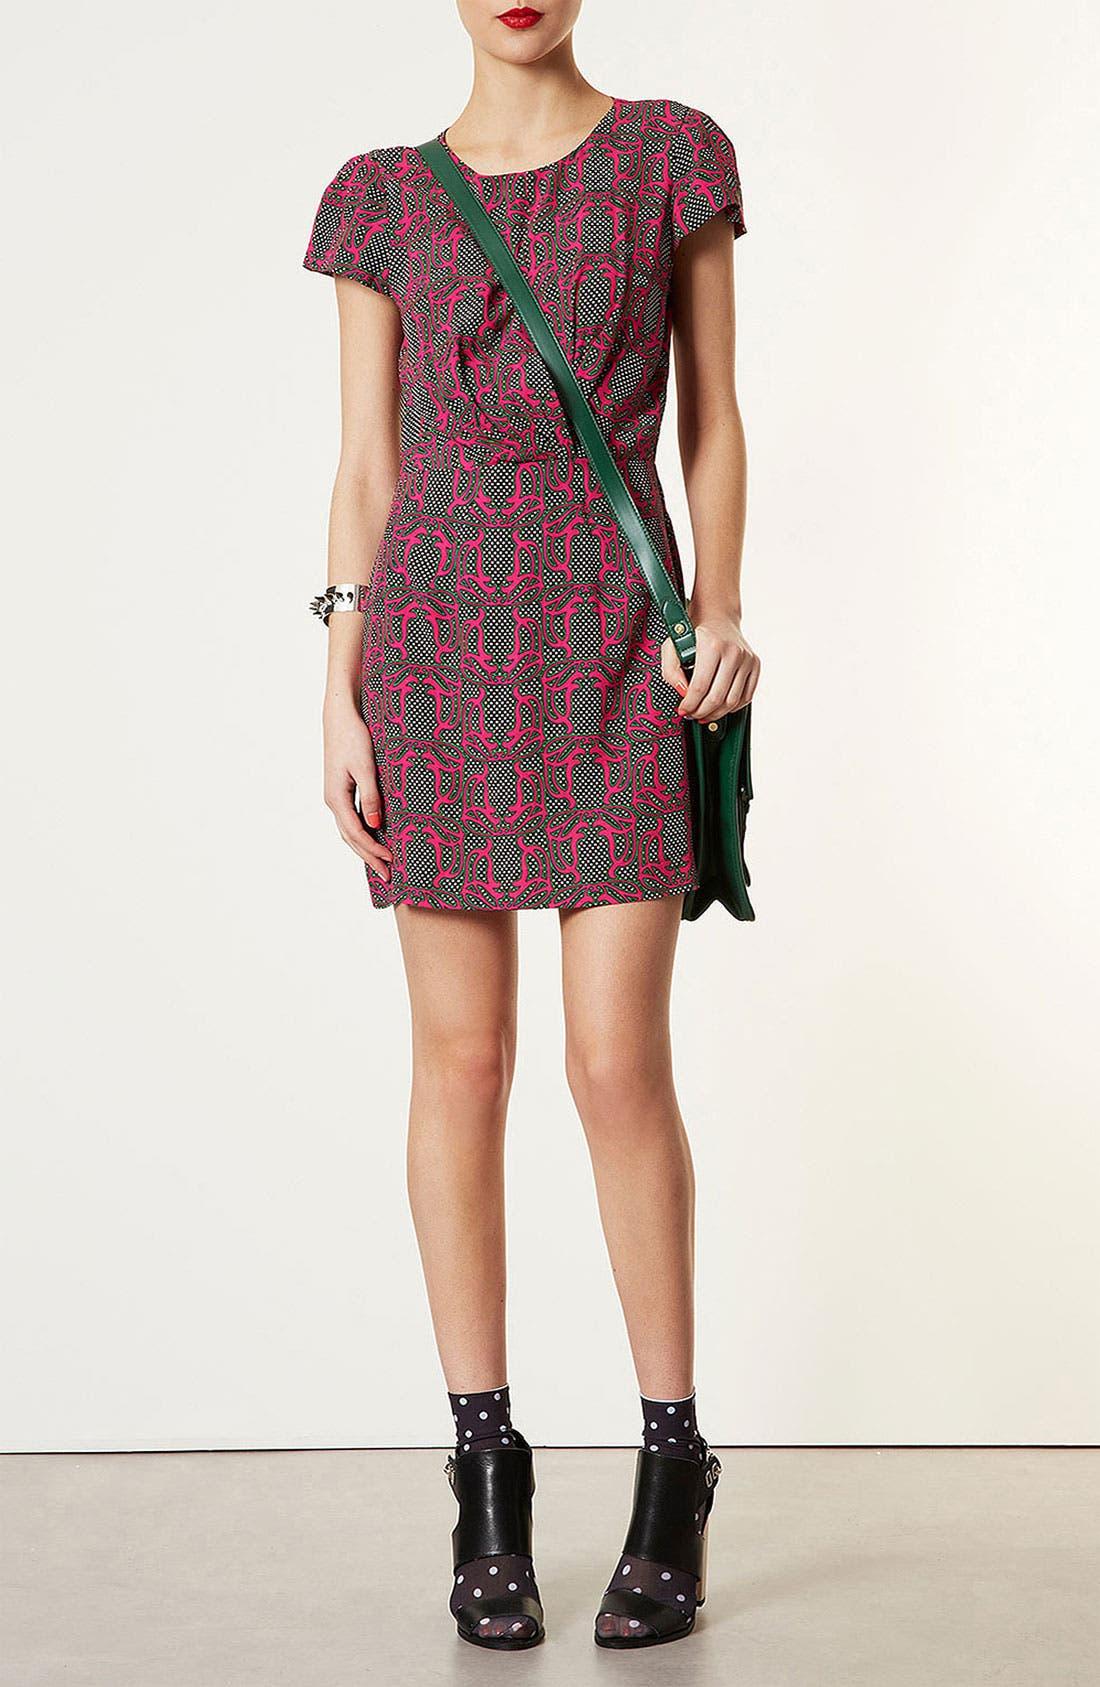 Main Image - Topshop 'Darcy' Vintage Print Dress